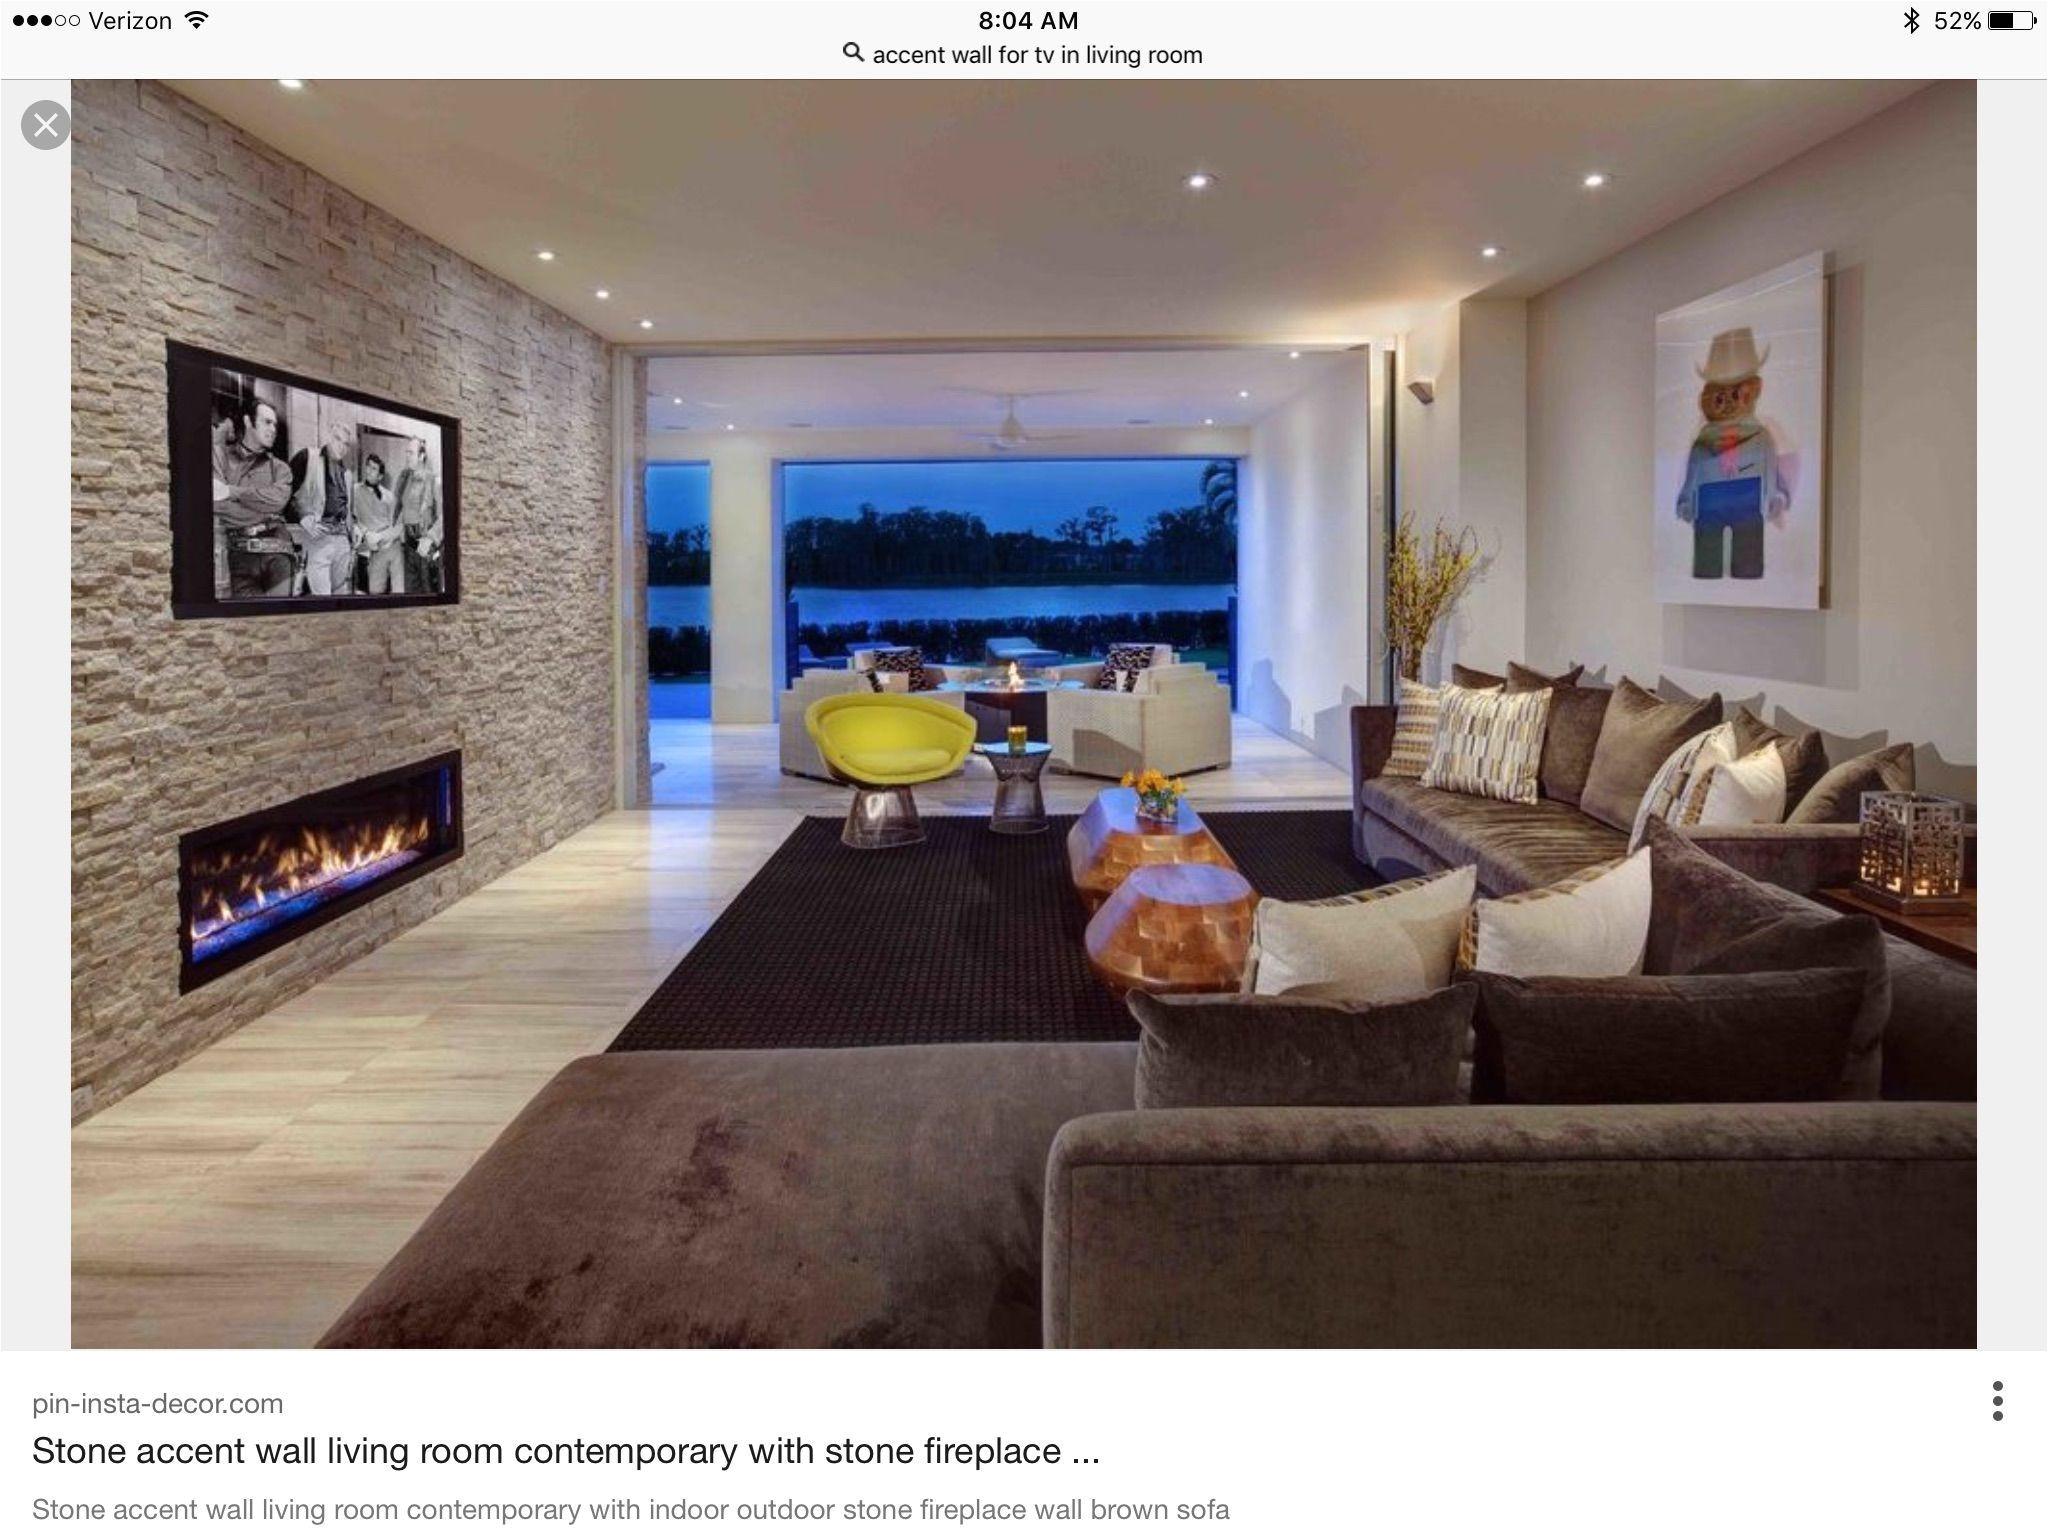 Over The Sofa Wall Decor Ideas Elegant Rooms Outdoors Elegant Flur Design Ideen Frisch Sofa Outdoor 0d